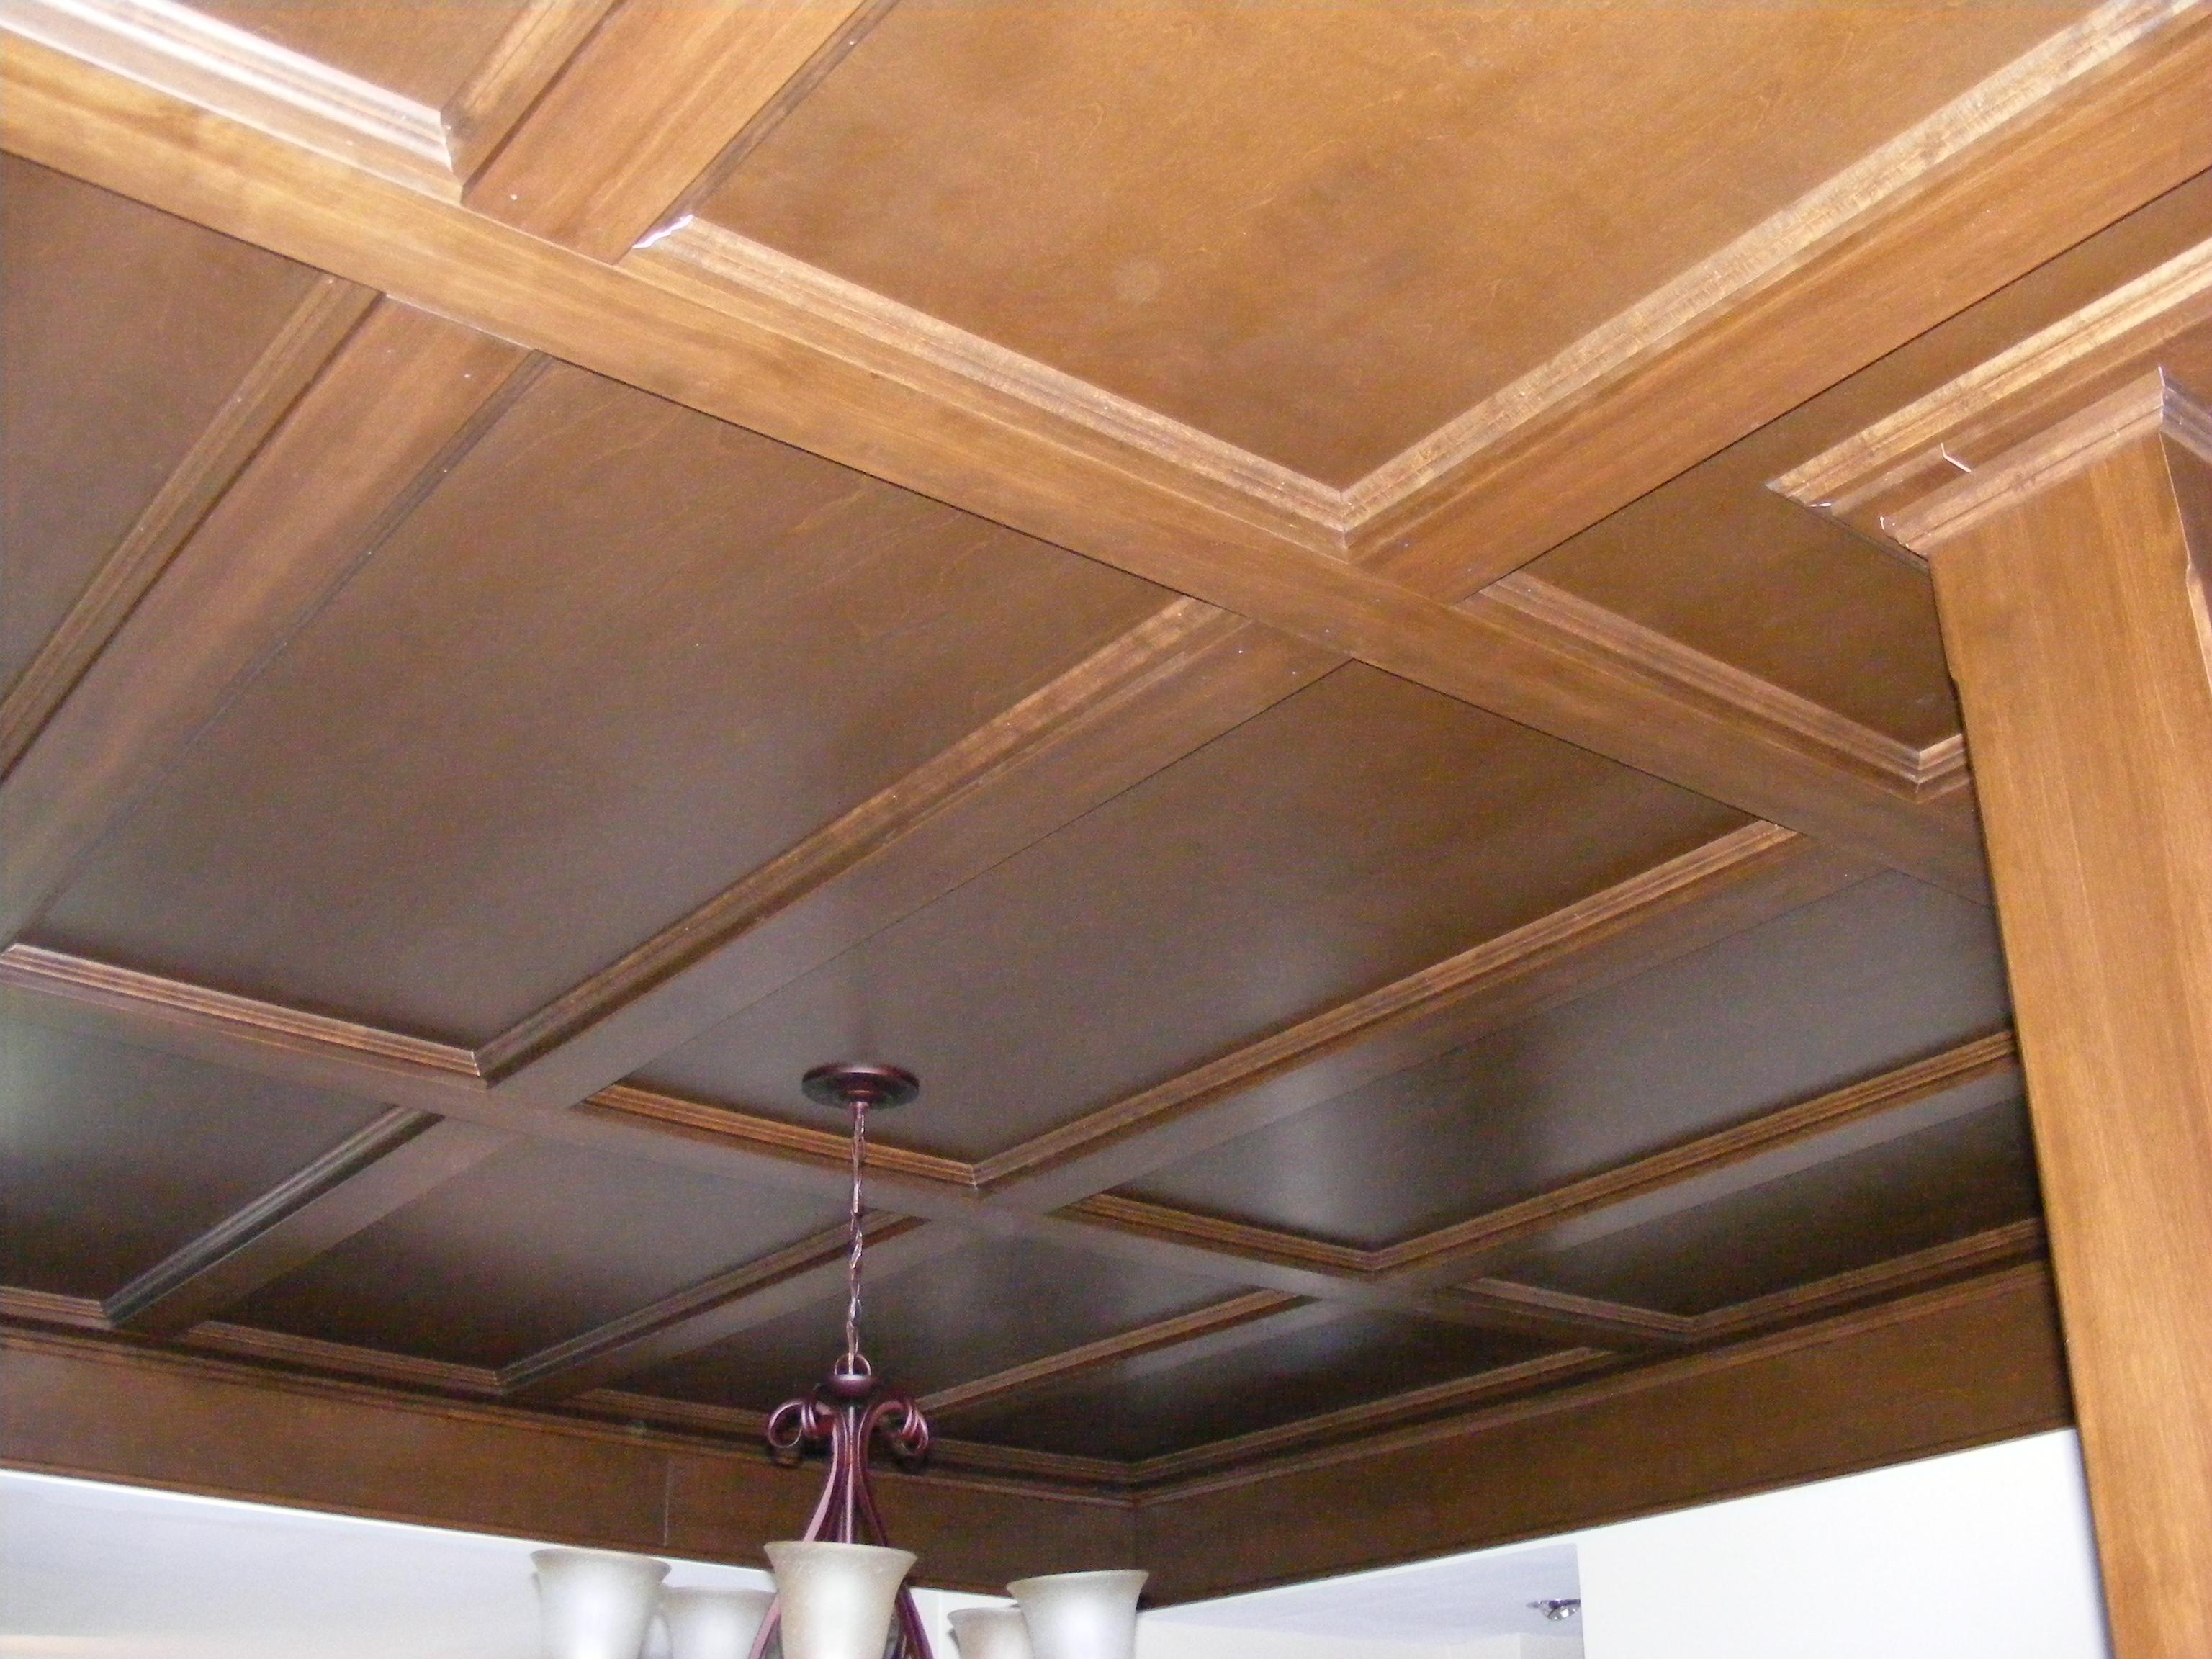 Plafond à caissons  joelgregoire.qc.ca  By: joelgreg41  Flickr ...